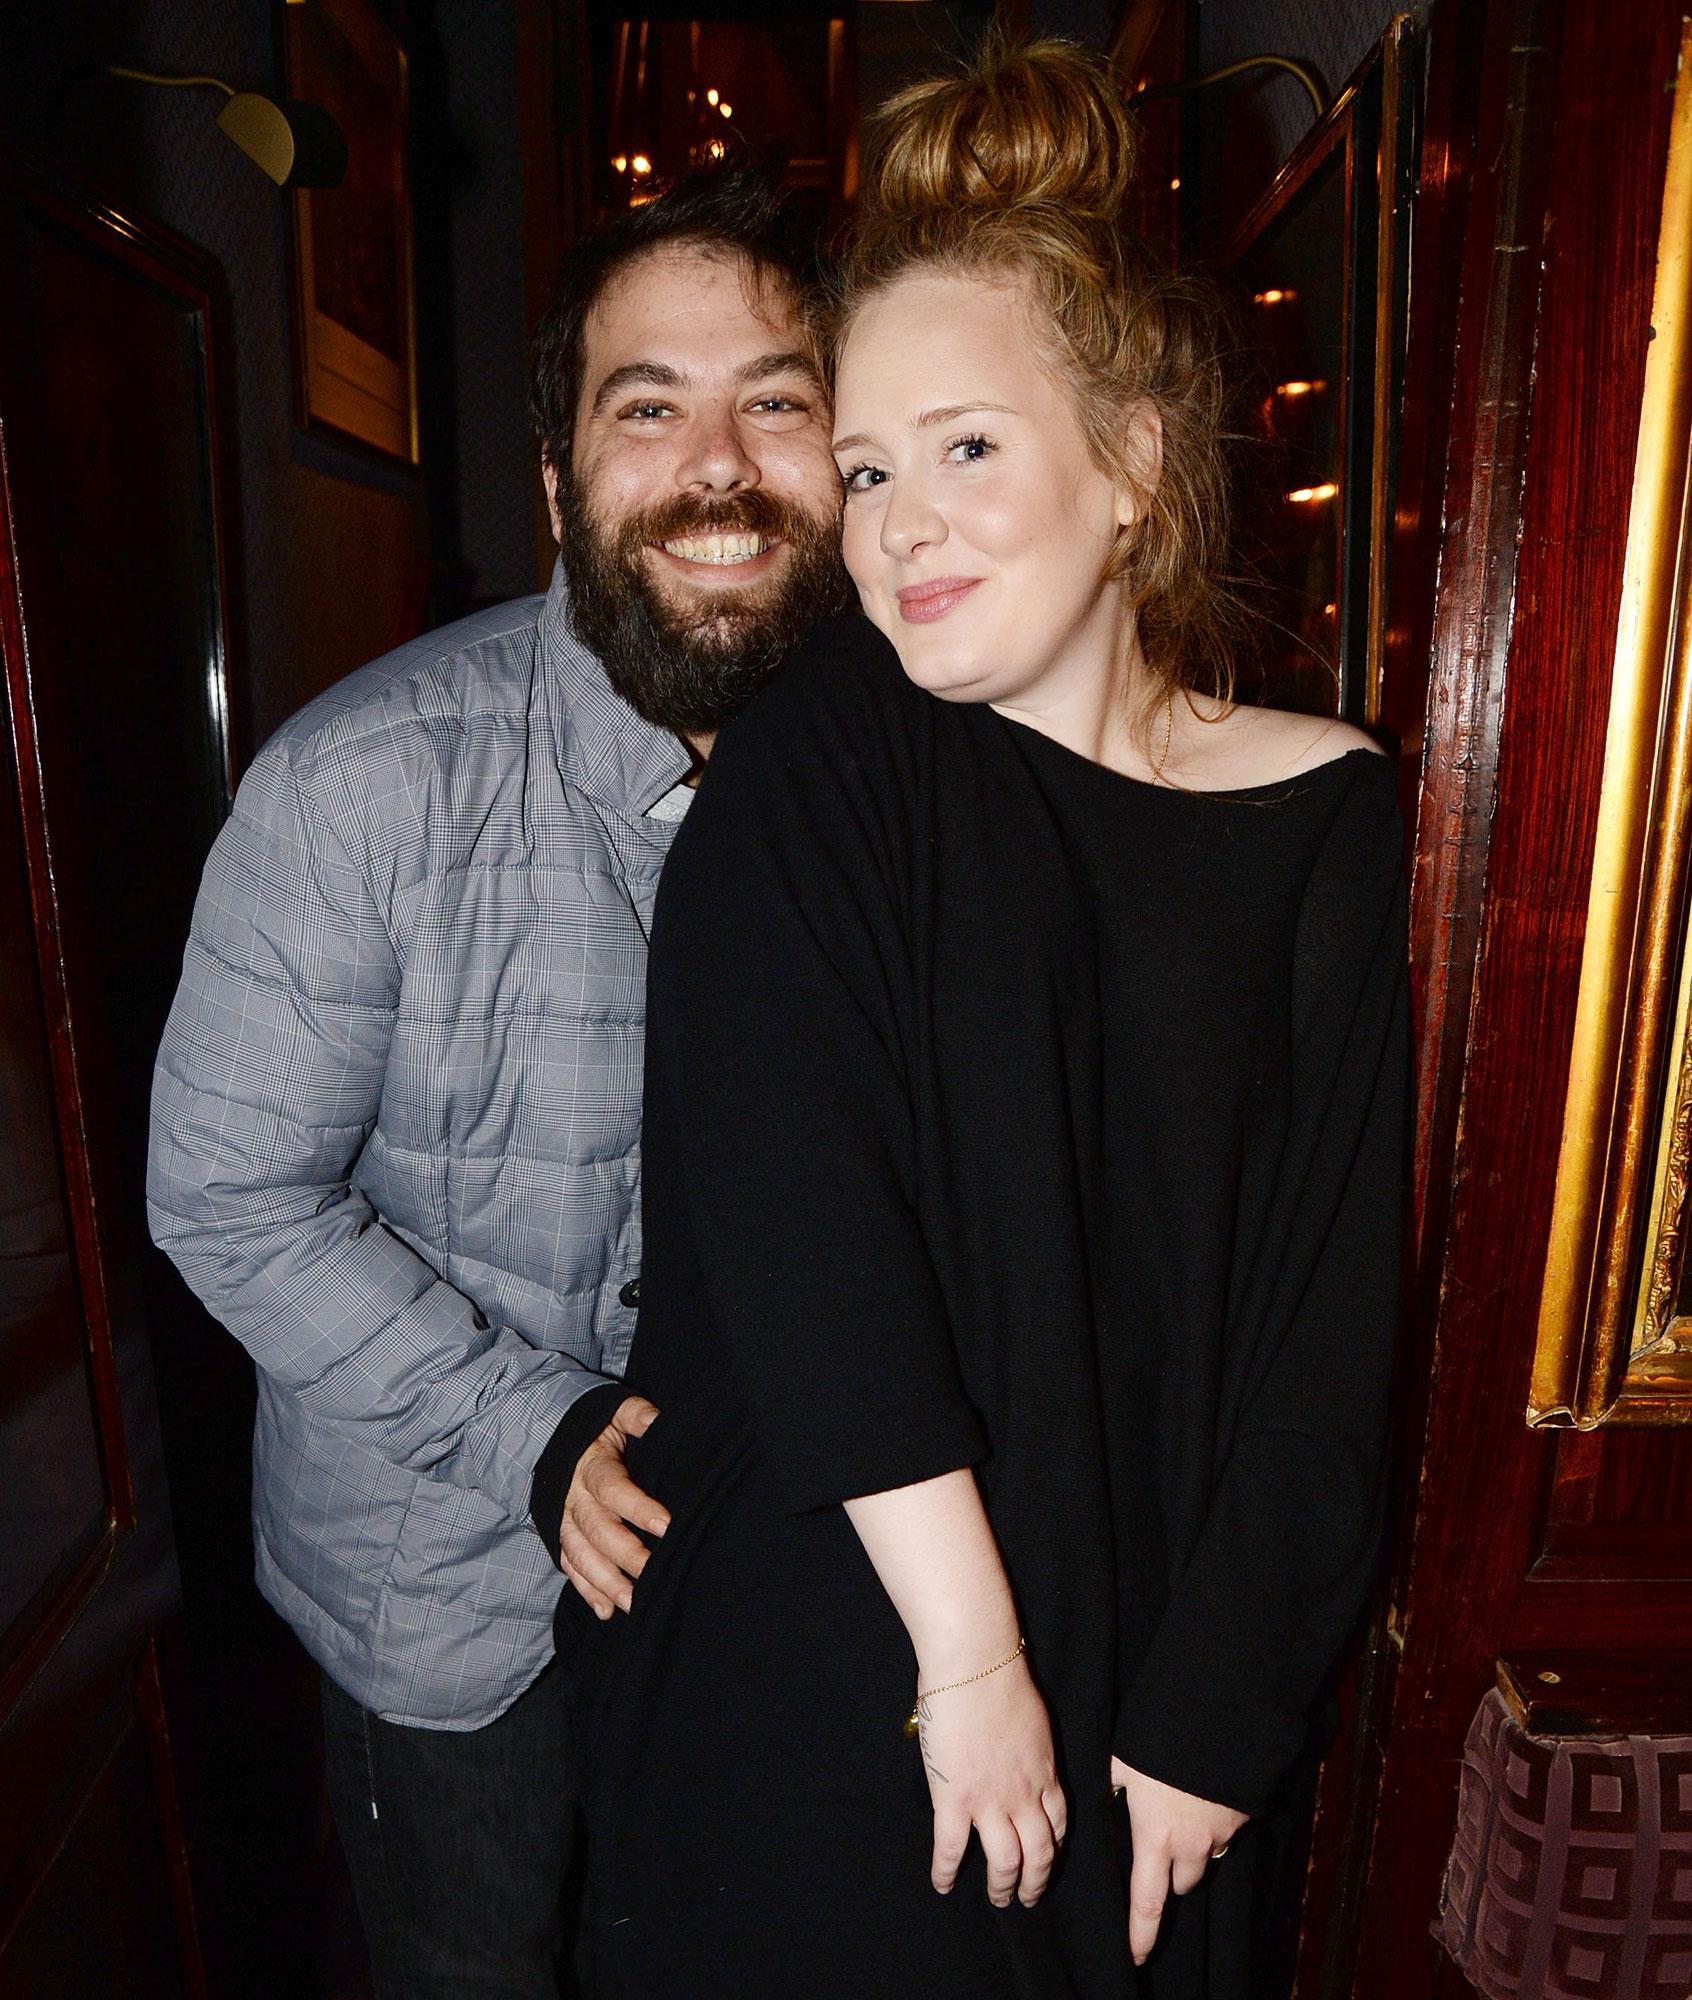 Adele and Simon Konecki in 2013 Files For Divorce